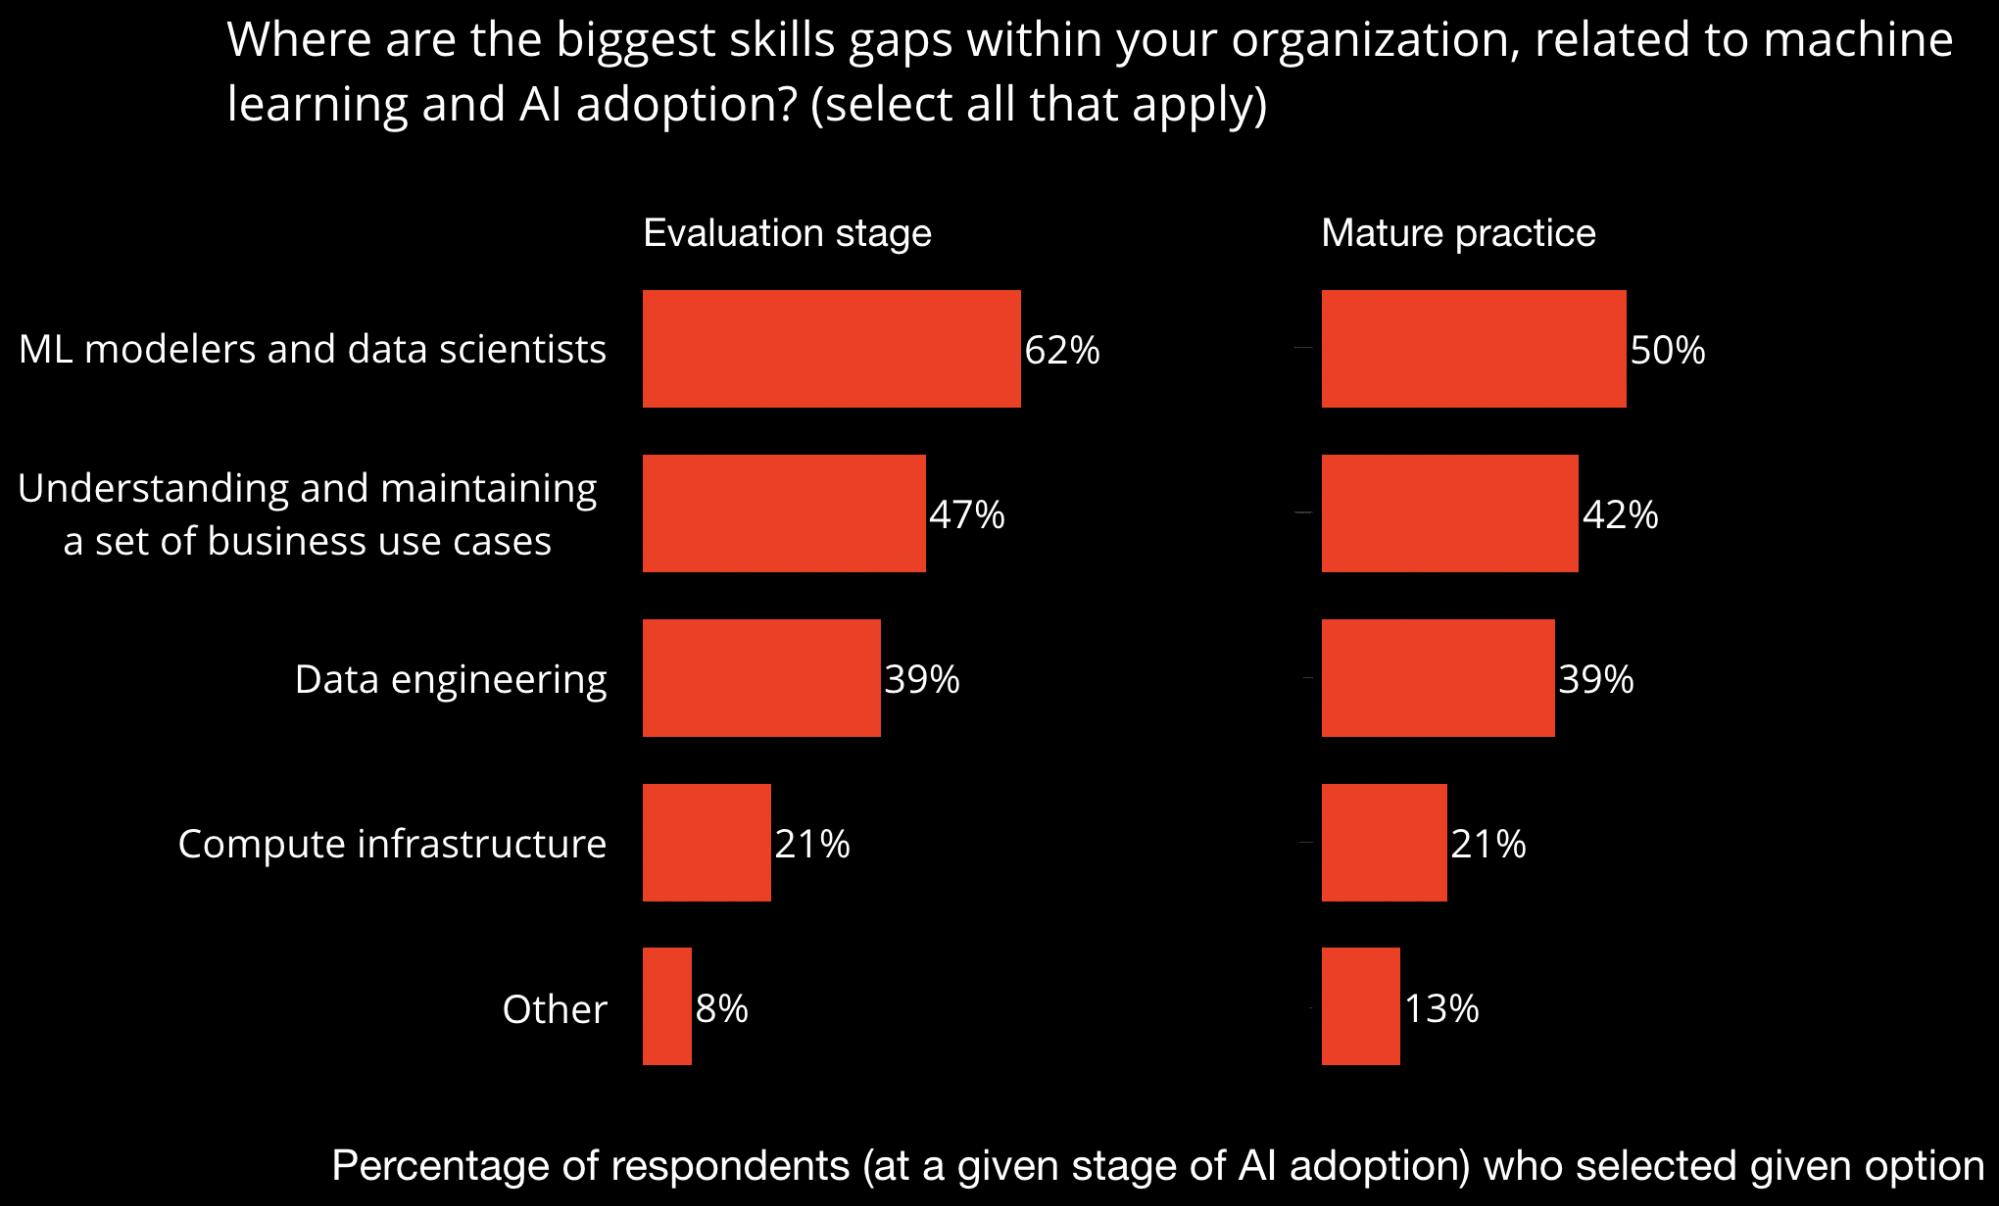 ai skills gaps